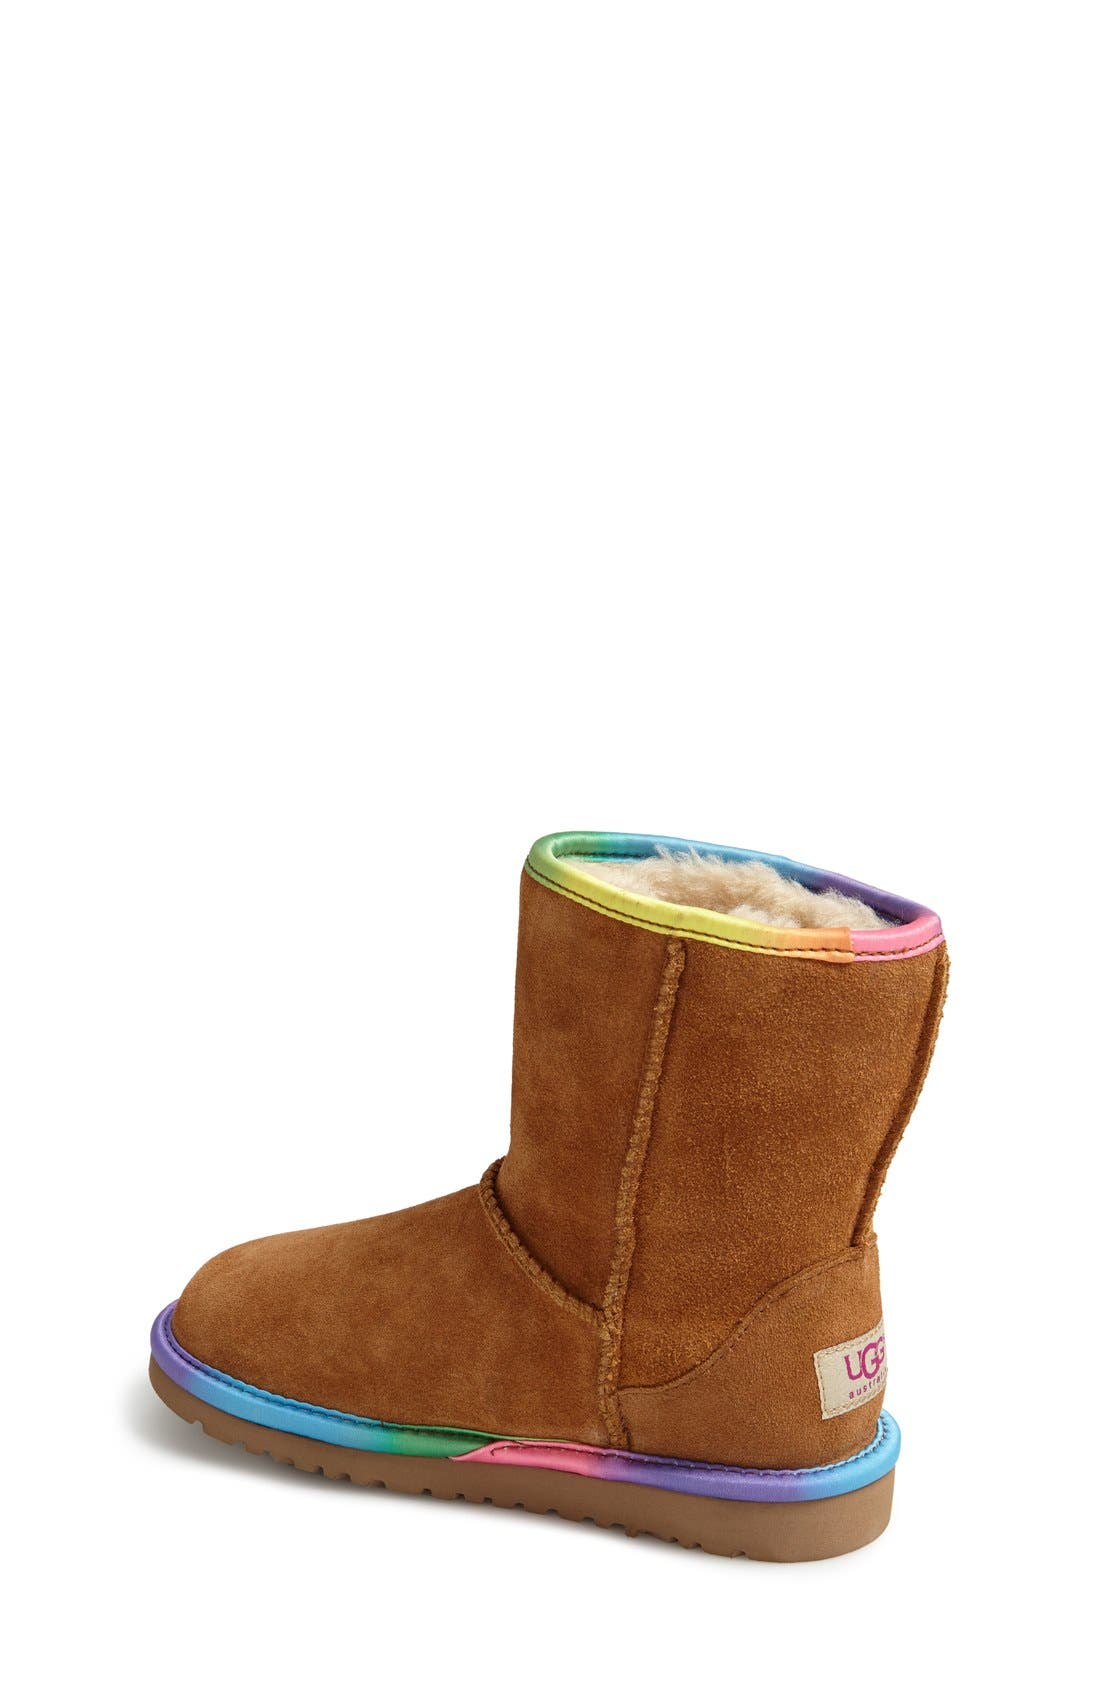 Australia 'Classic Short' Rainbow Boot,                             Alternate thumbnail 2, color,                             219